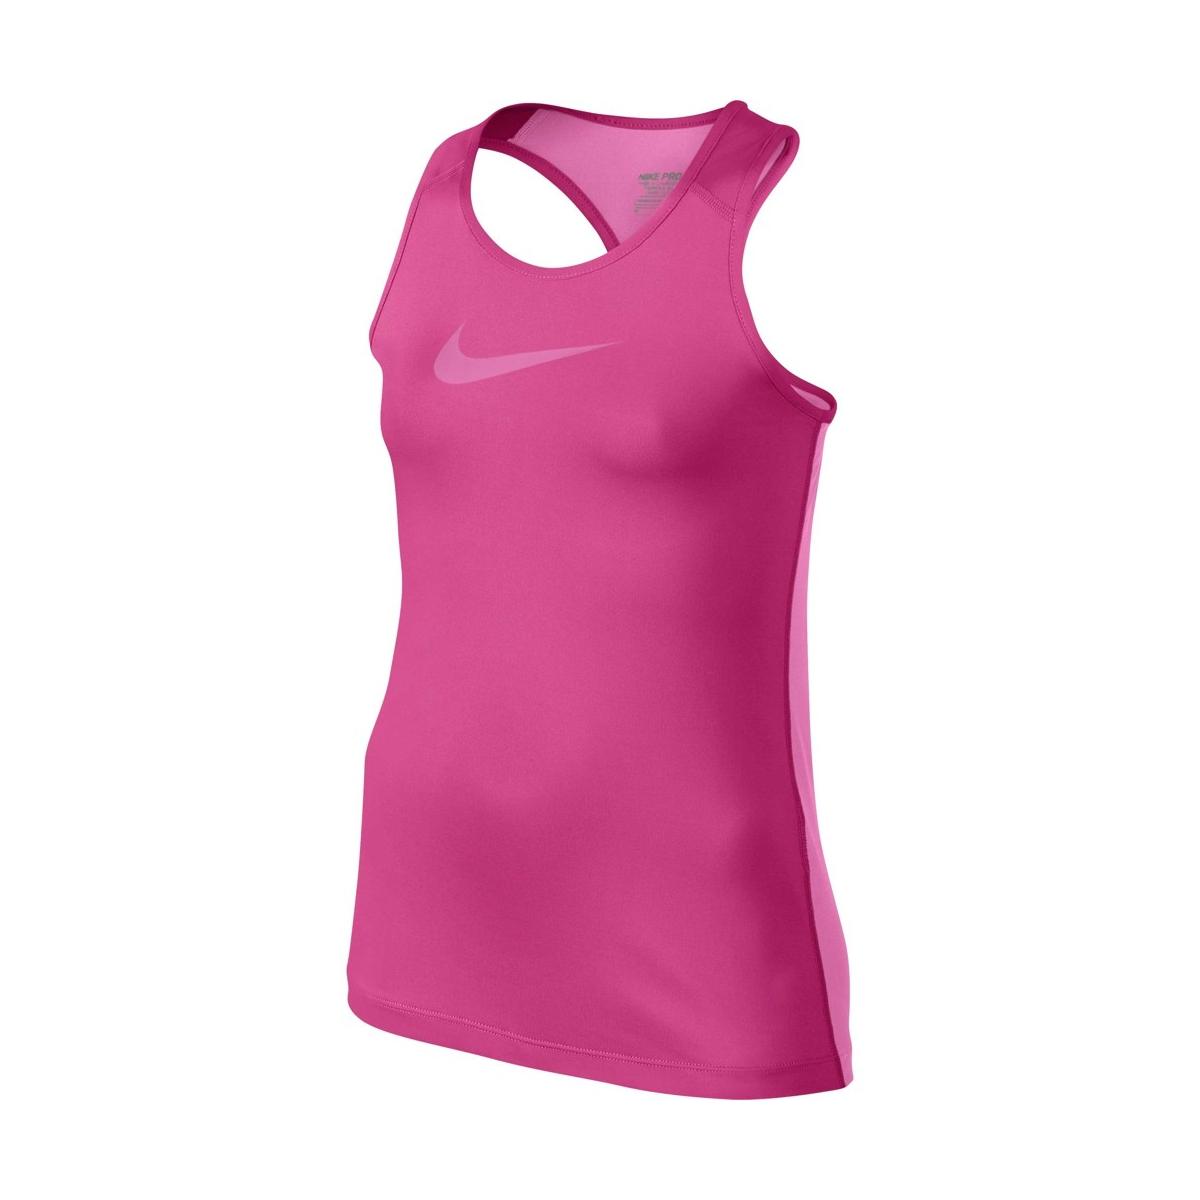 Nike Summer Tank Pink Bambina 1